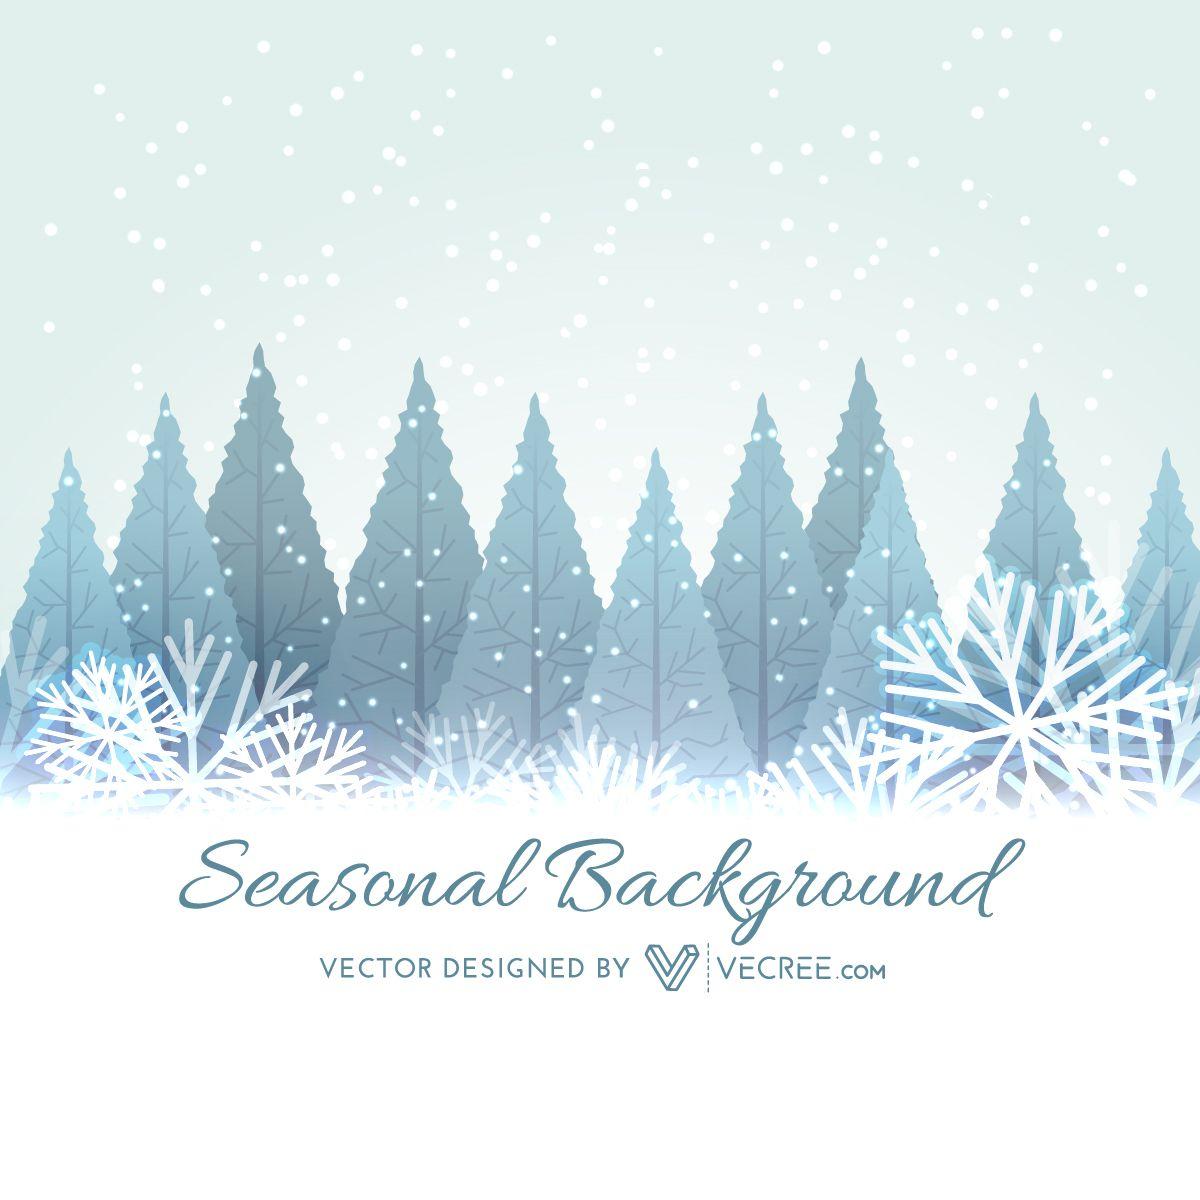 xmas trees on snowy winter landscape vector download. Black Bedroom Furniture Sets. Home Design Ideas